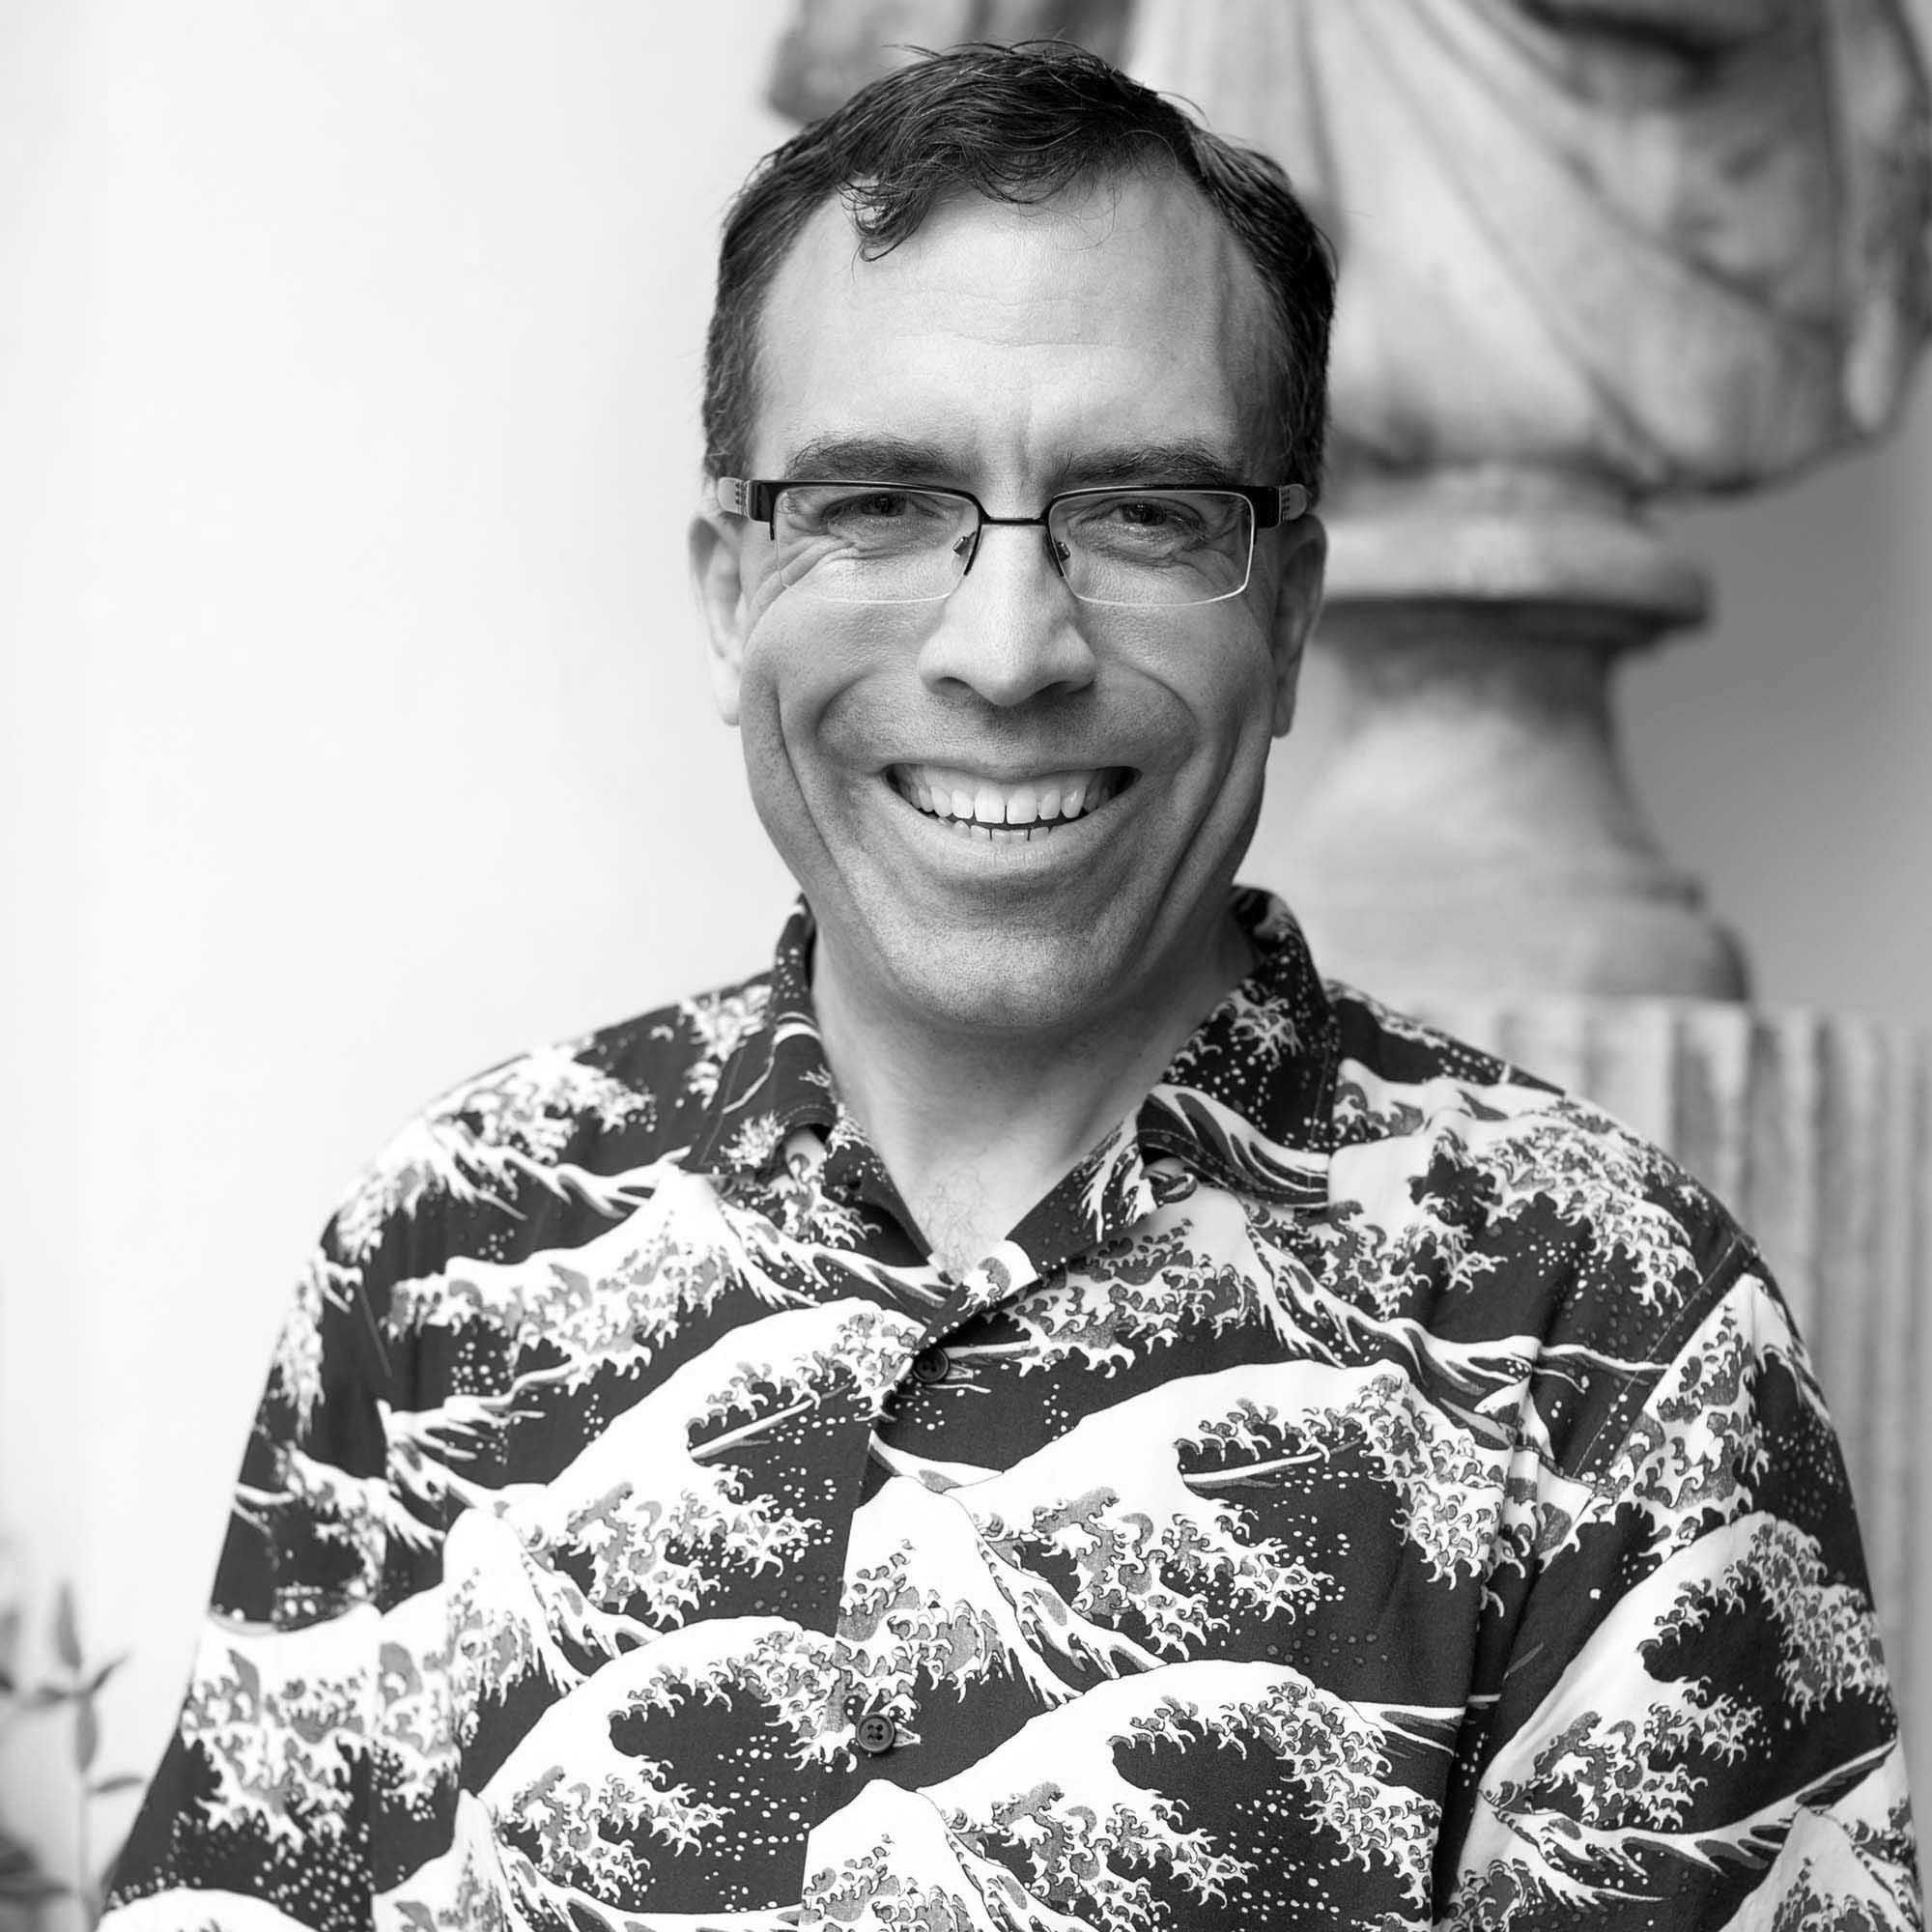 Andy Zmolek Sonophilian